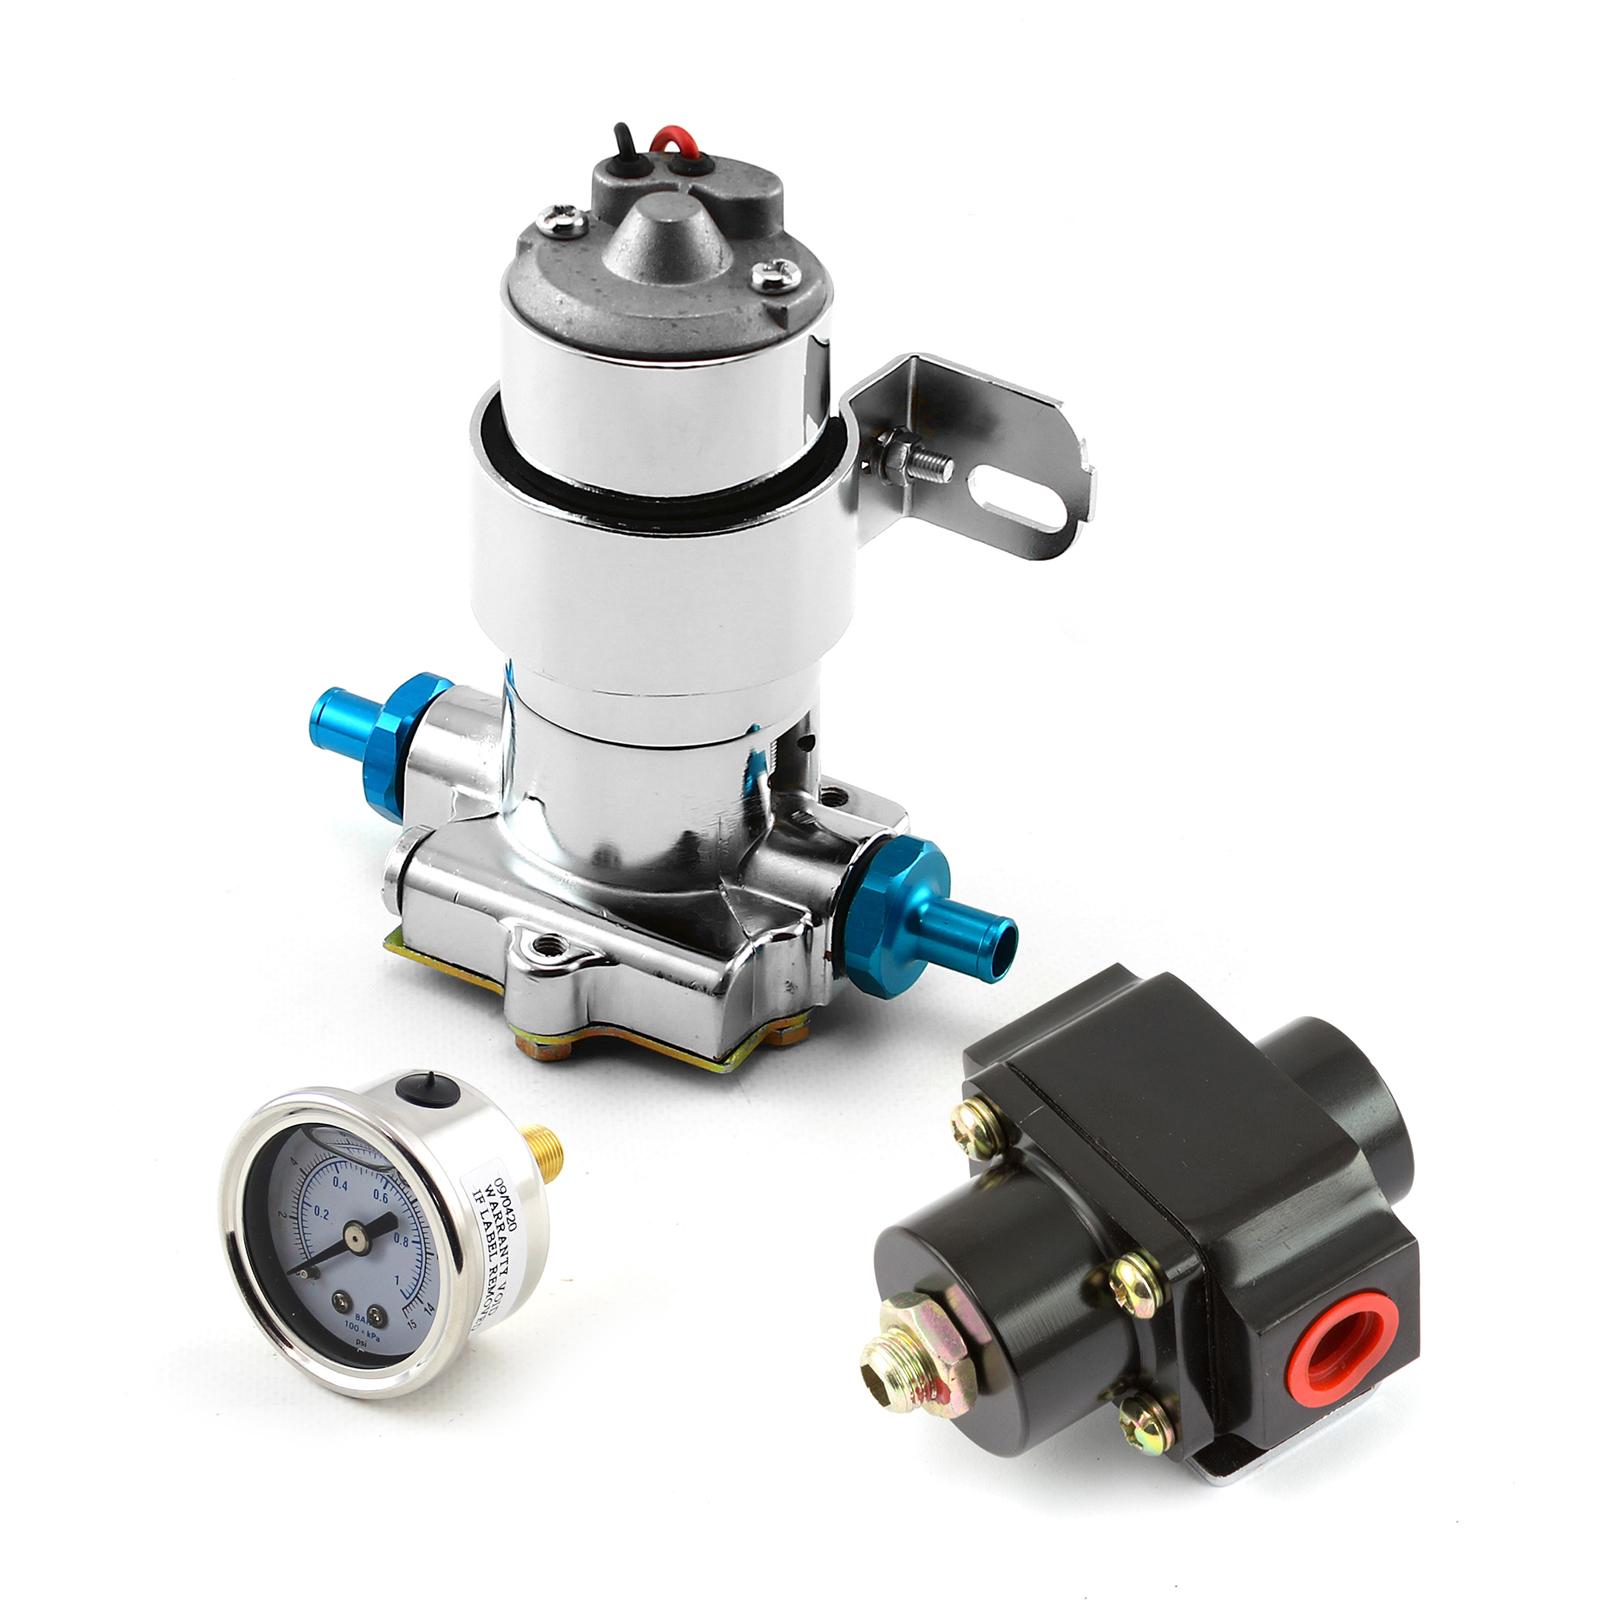 140 Gph Universal Chrome Electric Fuel Pump Black Regulator & Gauge Combo Kit